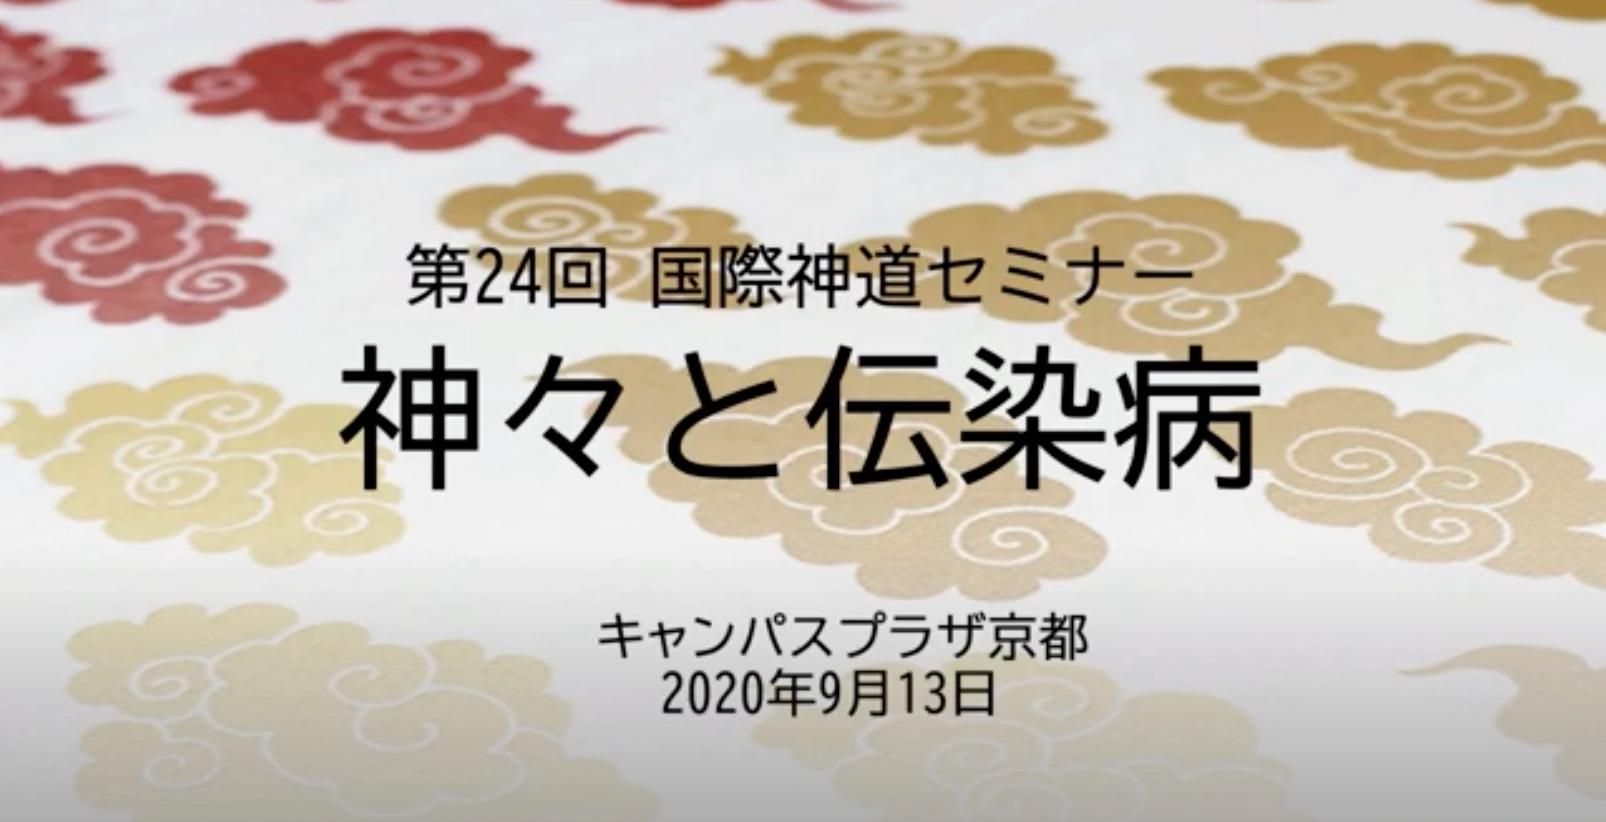 第24回国際神道セミナー『神々と伝染病』講演公開開始